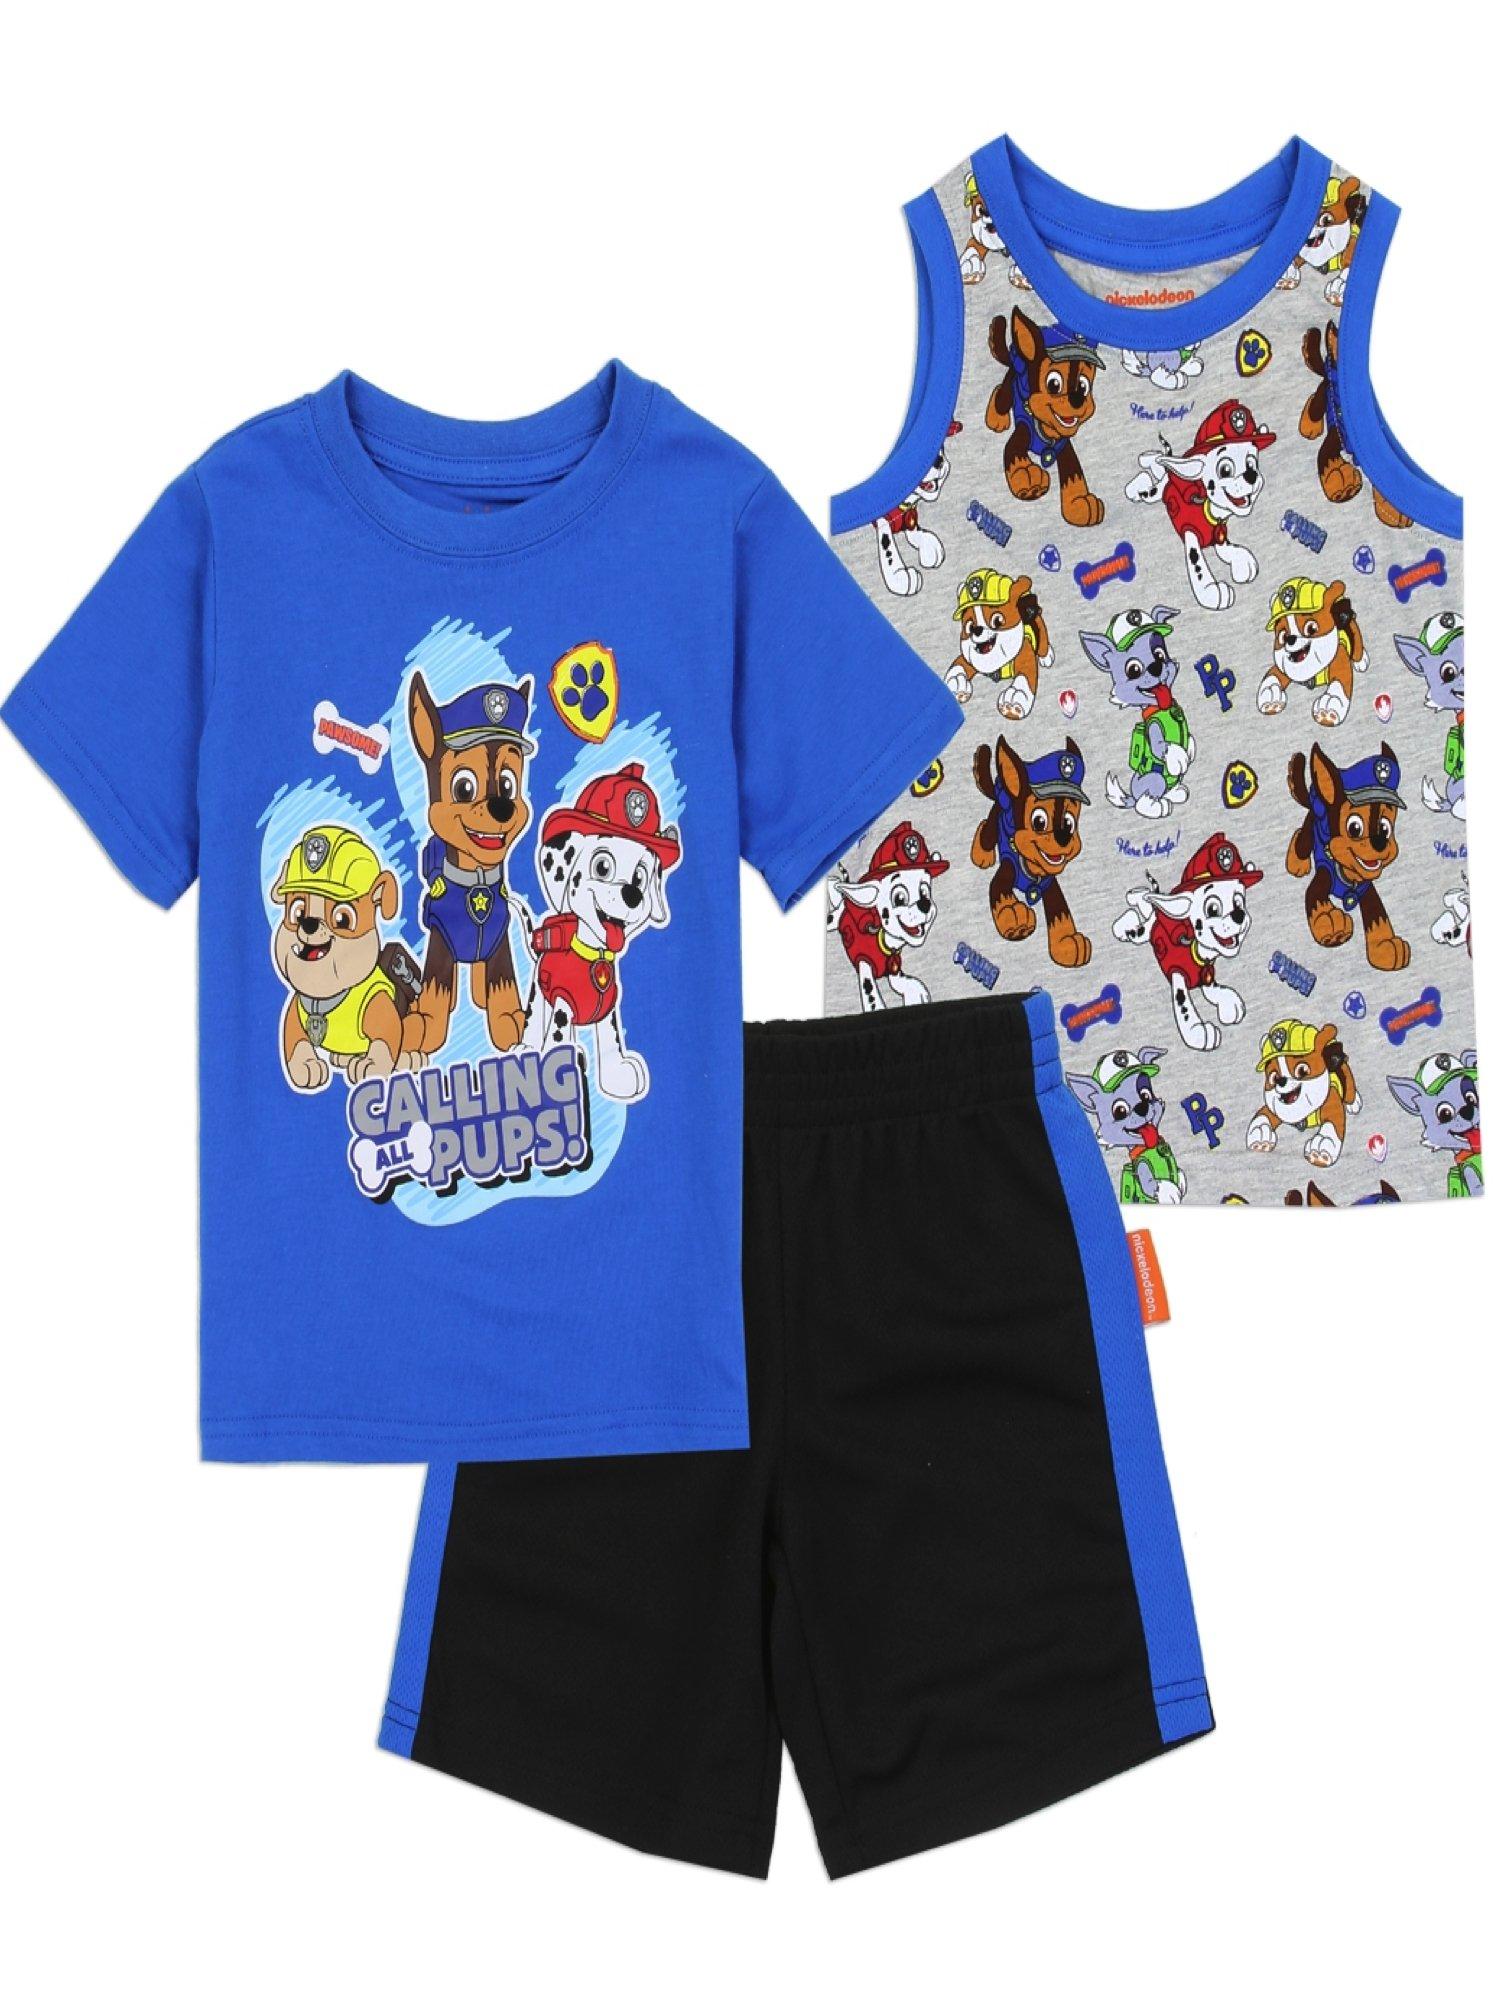 Paw Patrol Toddler Boys' 3PC Short Set, Blue/Gray (US Toddler Boys 3T)